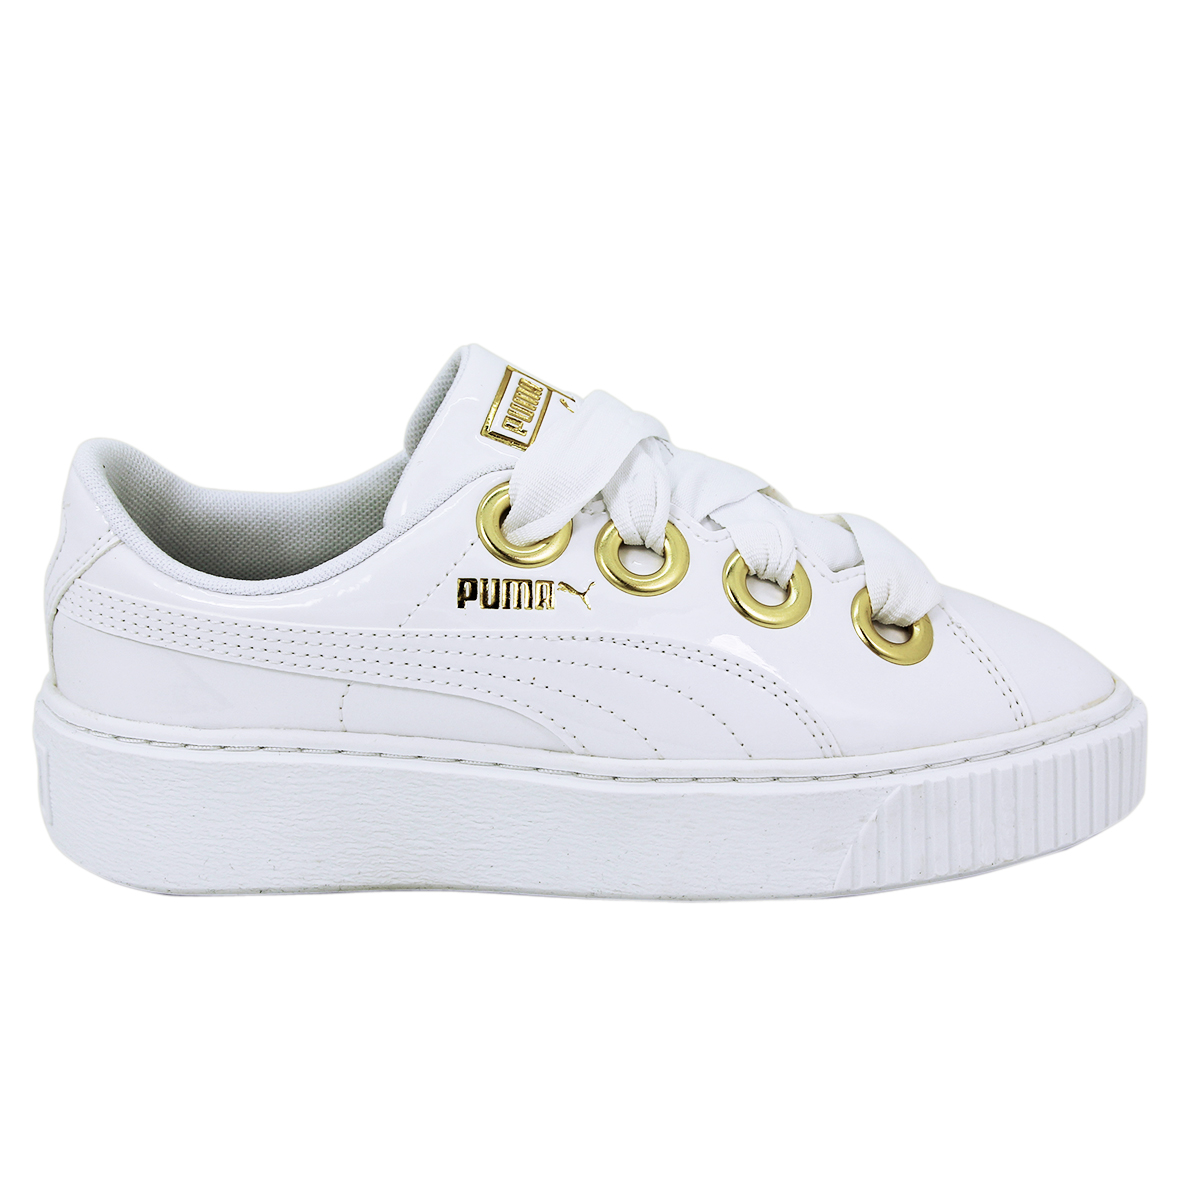 Details zu Puma PLATFORM KISS PATENT WN S Damen Sneakers Schuhe Neu